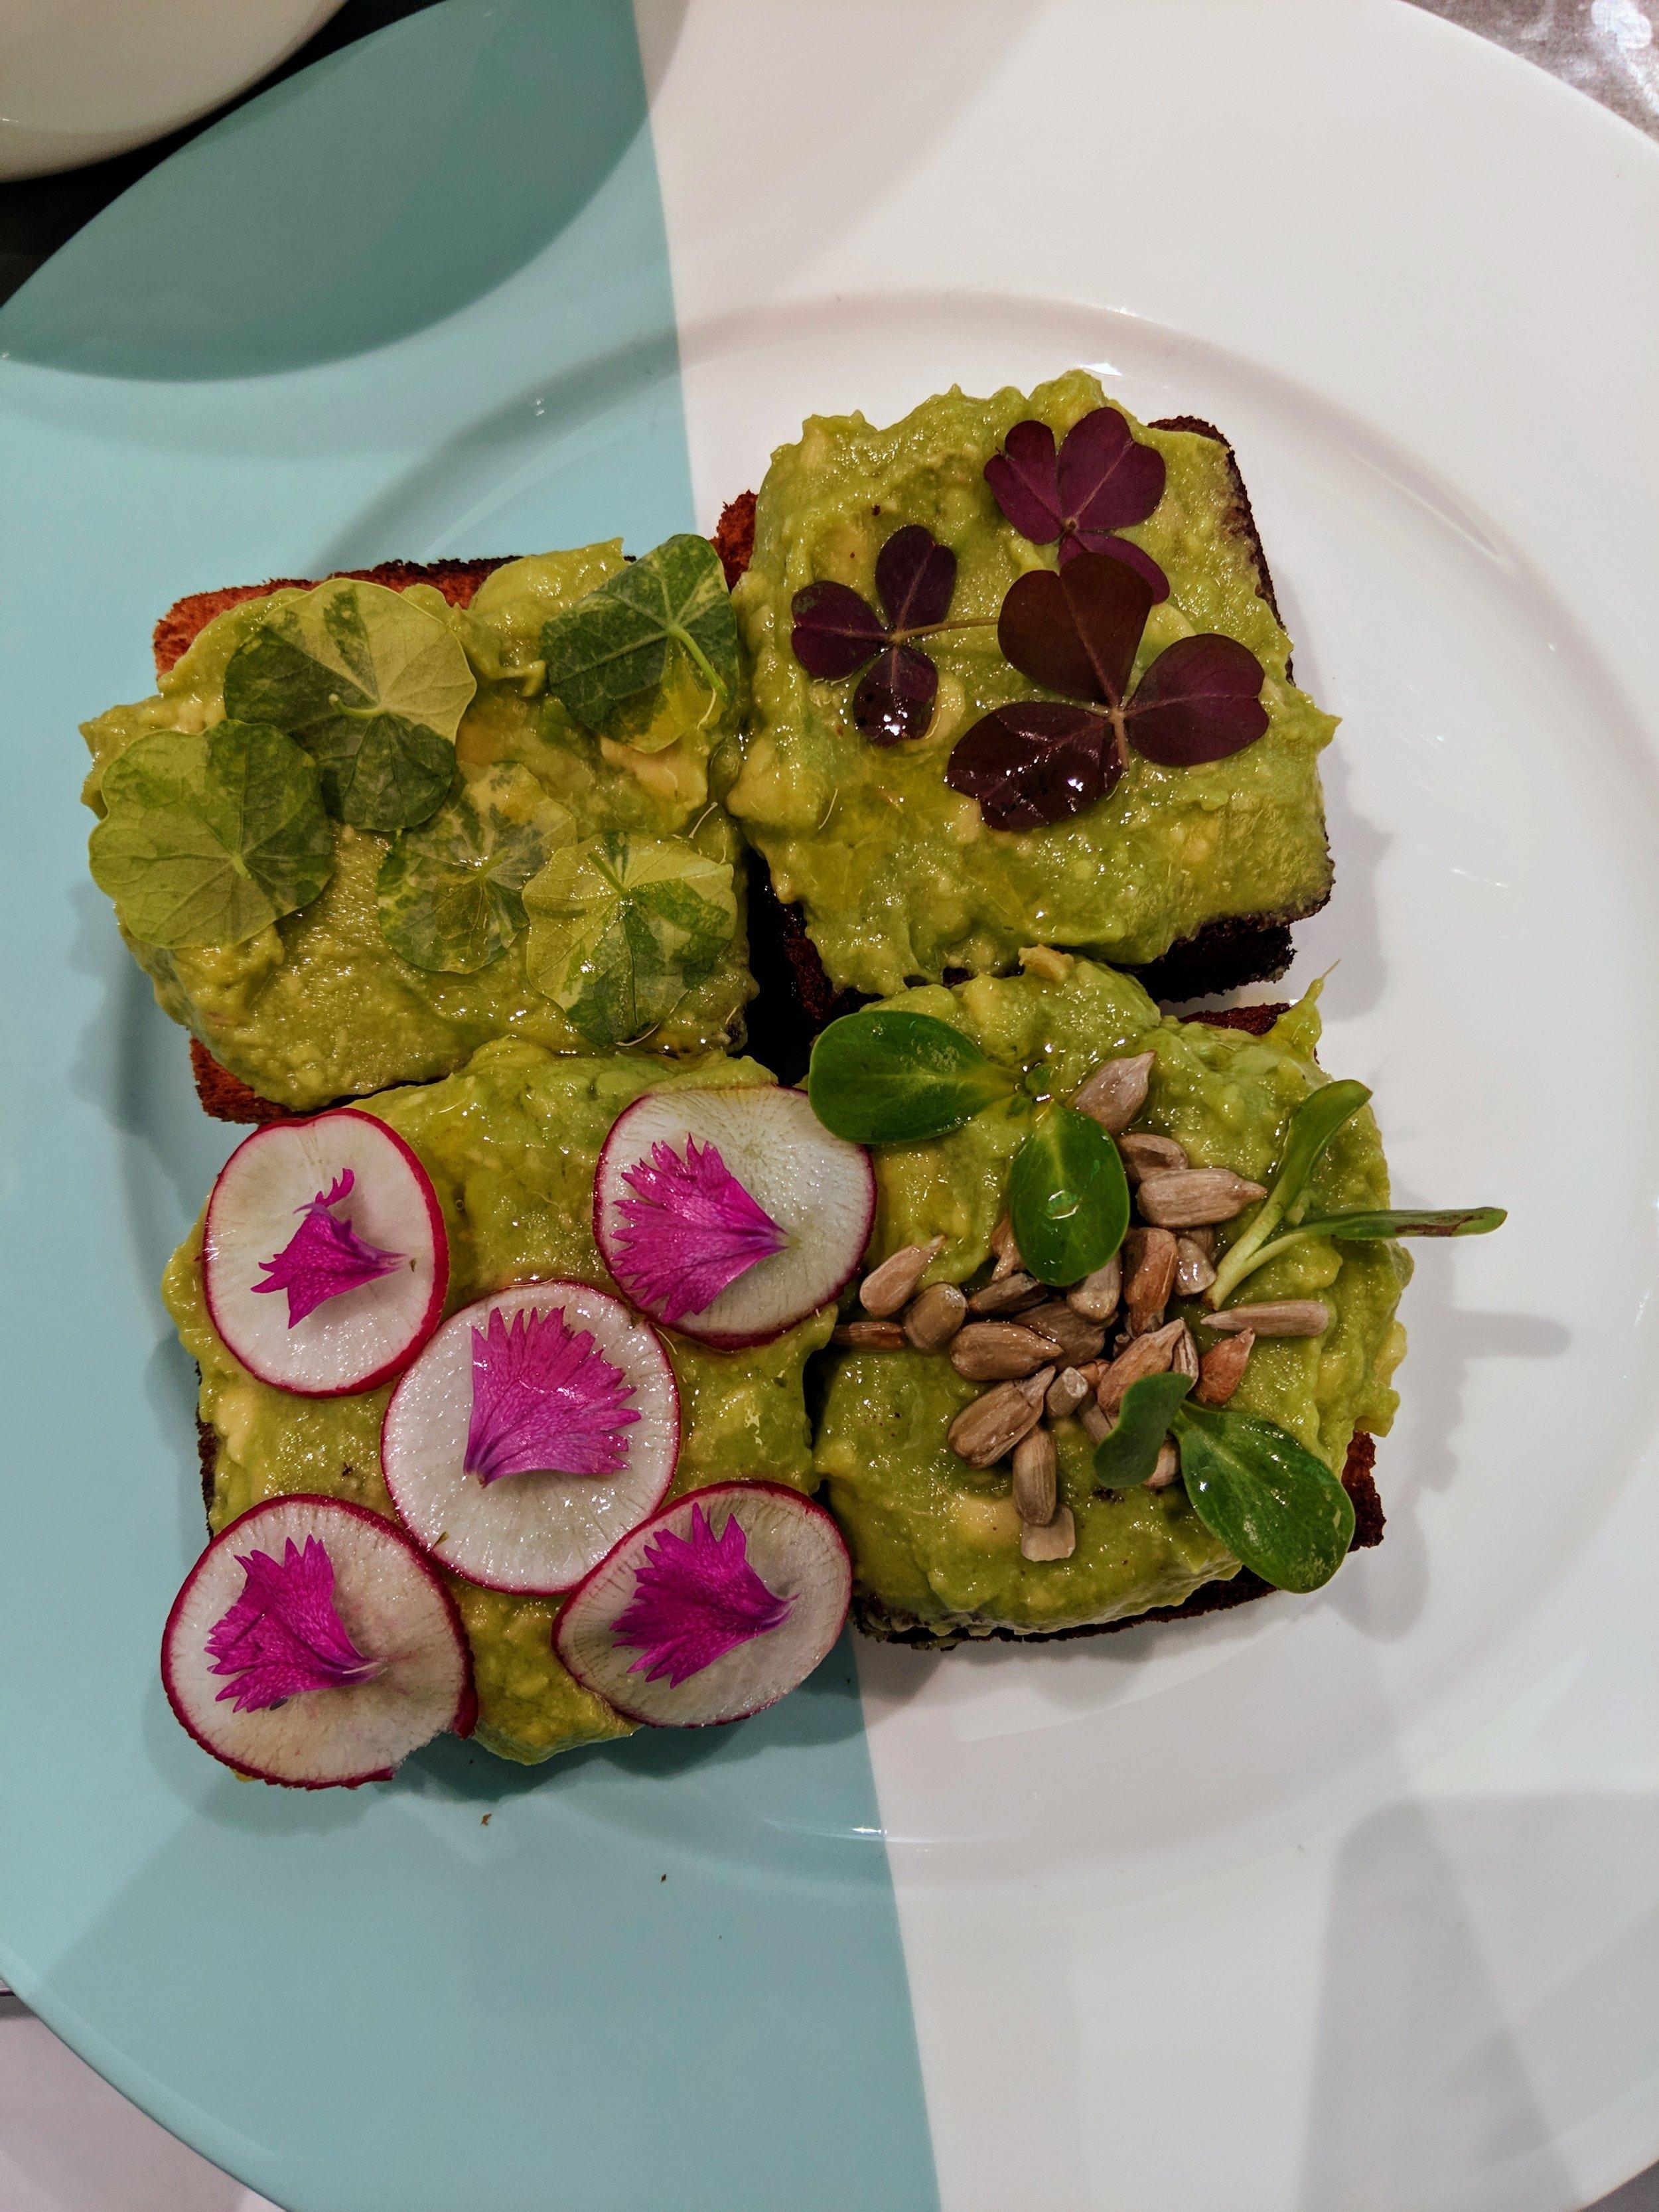 AVOCADO TOAST  Radish, nasturtium, sorrel, sunflower seeds & sprouts